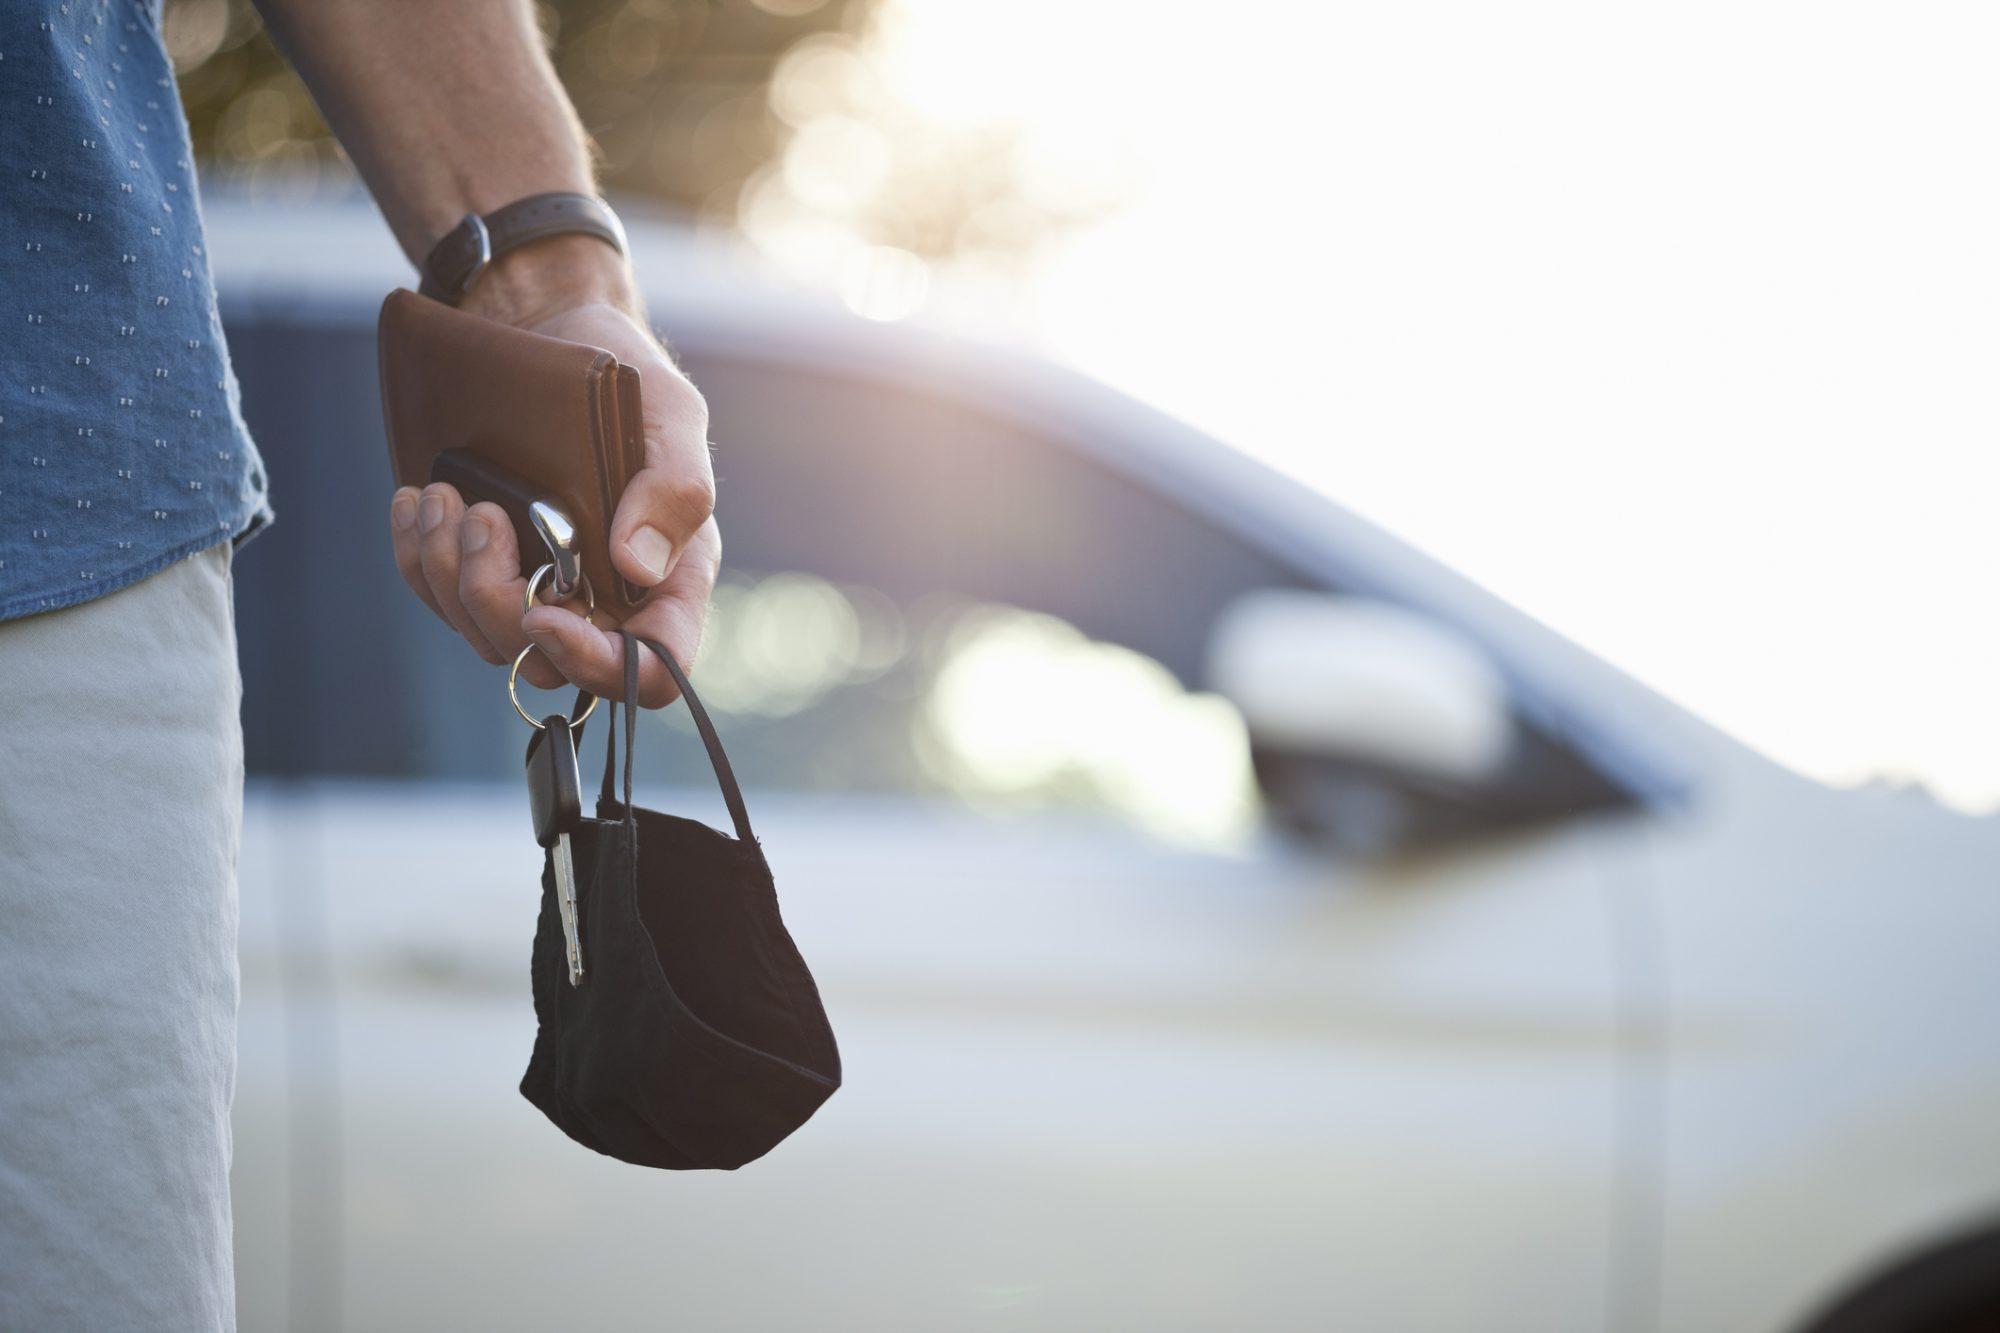 Wallet and keys